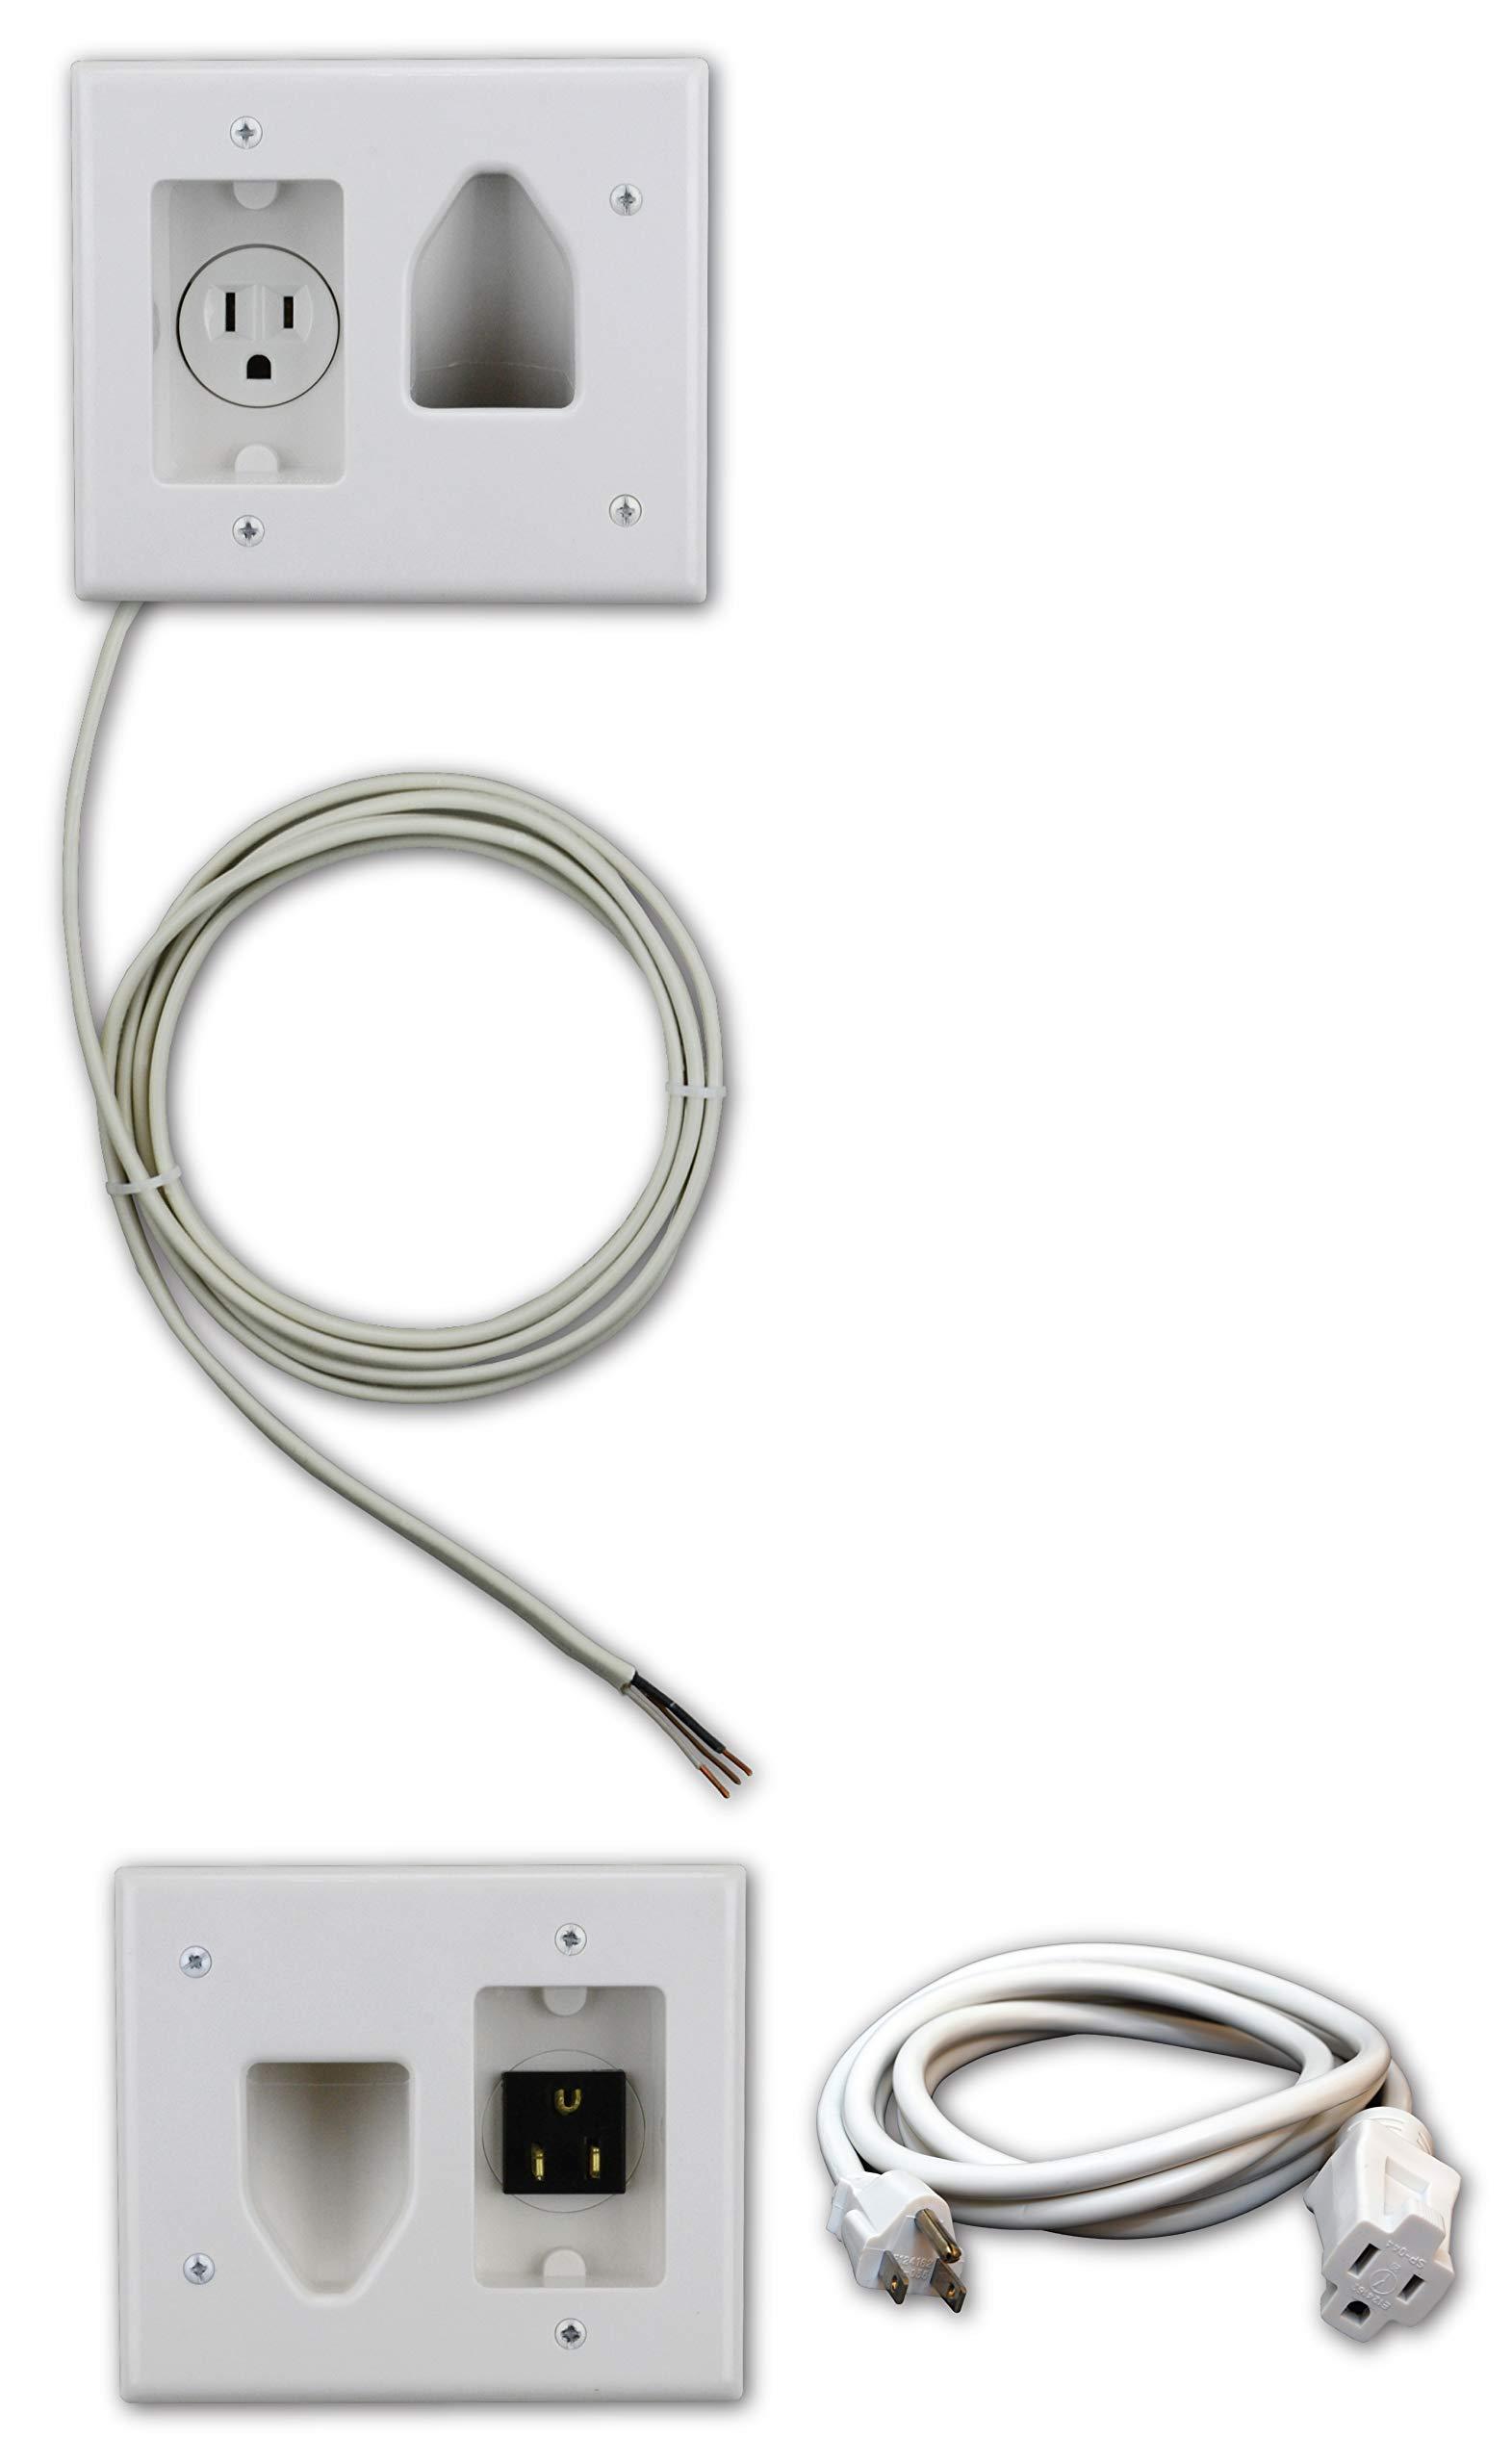 Datacomm Electronics 50-3323-WH-KIT Flat Panel TV Cable Organizer Kit with Power Solution - White by Datacomm Electronics